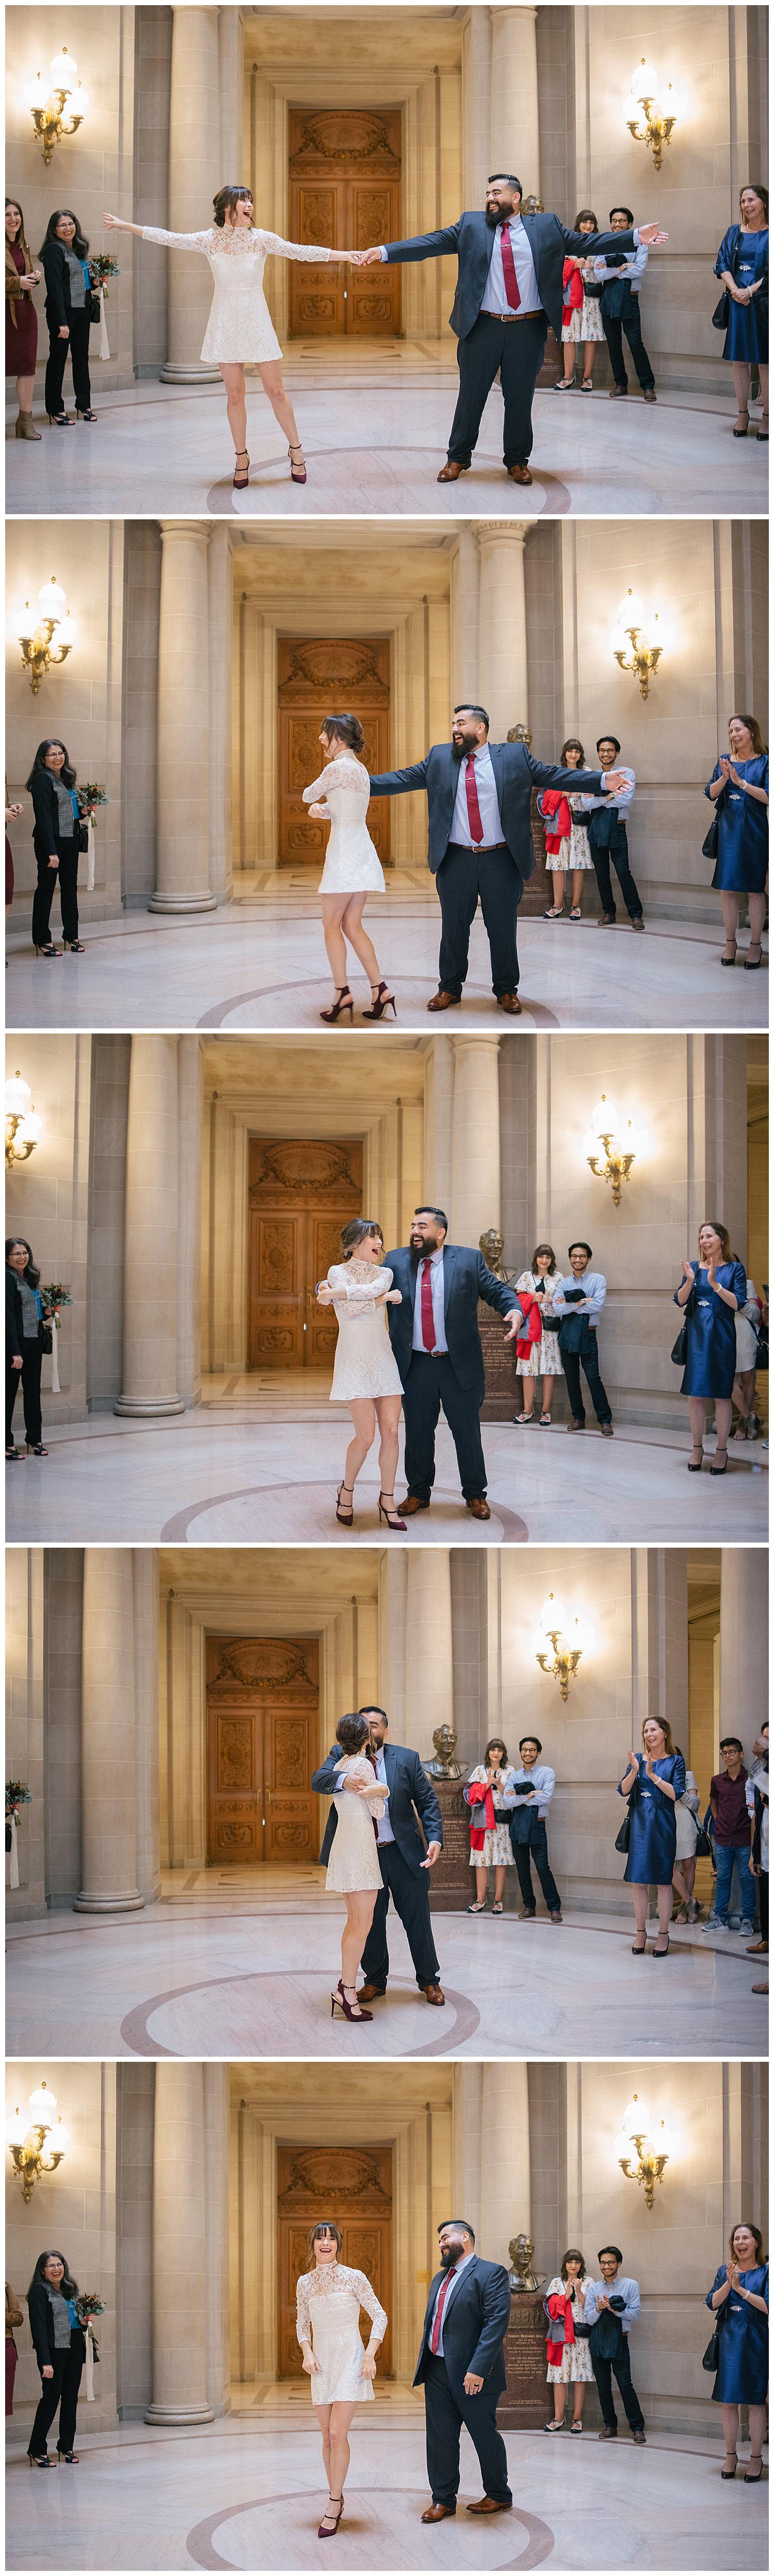 khariza-rae-photography-bay-area-wedding-photographer_0053.jpg